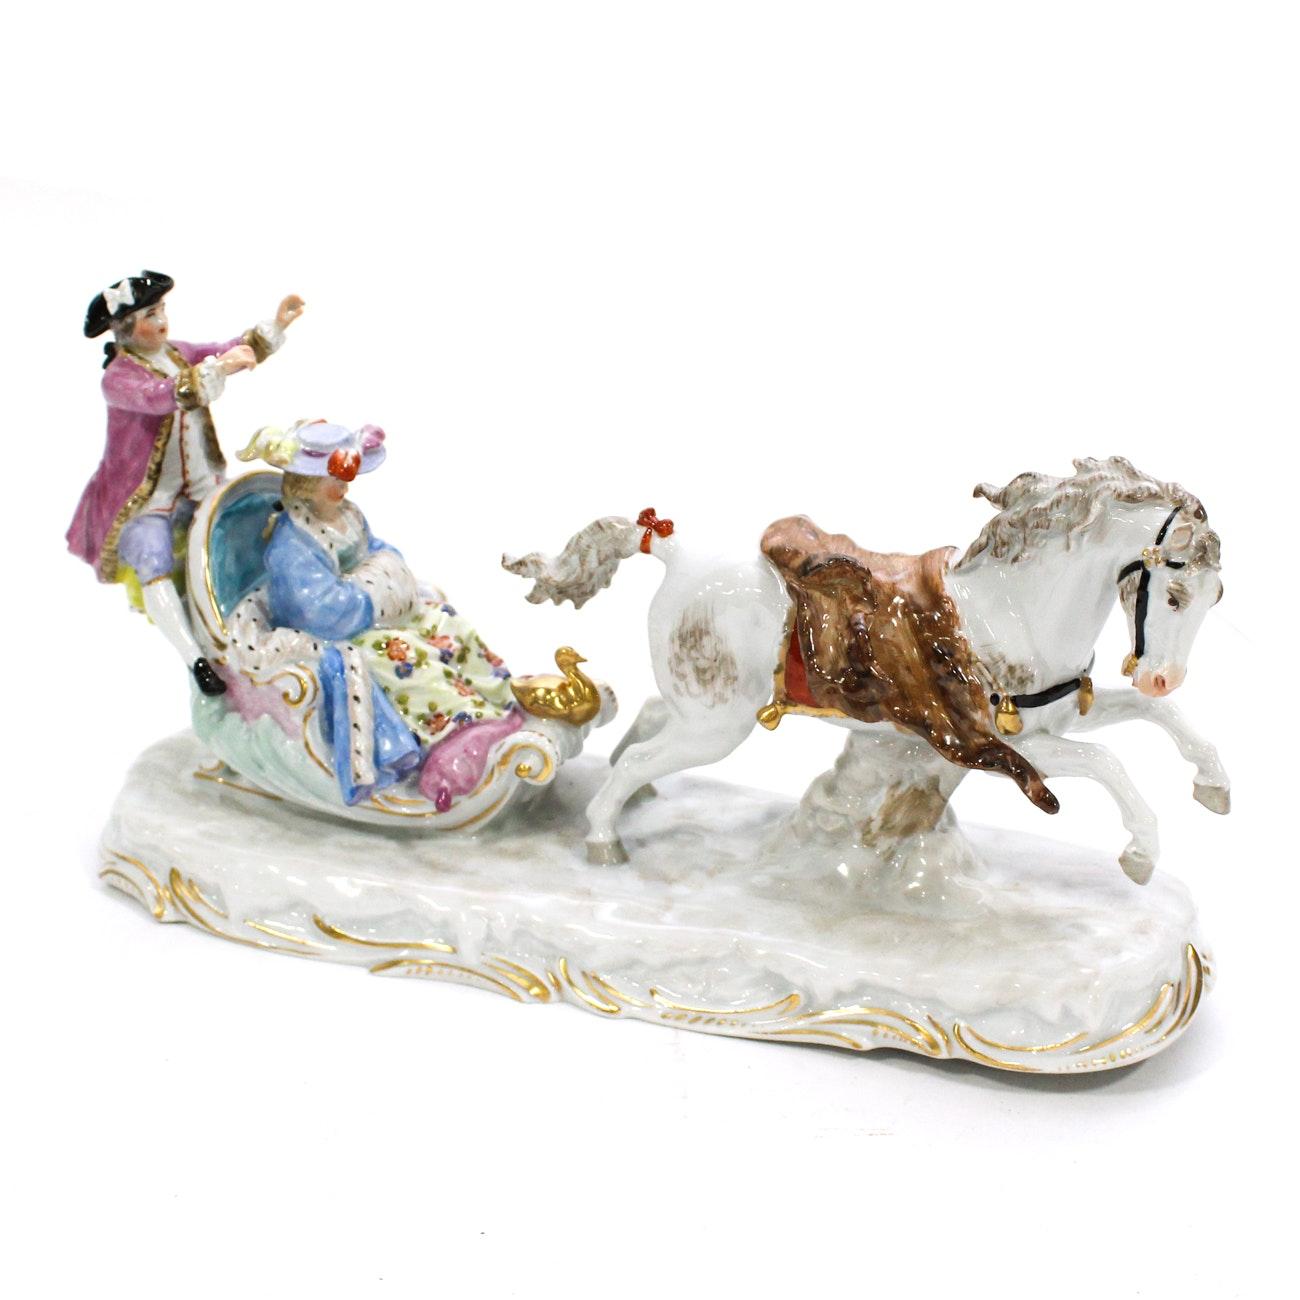 Dresden (Potschappel) Porcelain Model of a Sleigh Ride, 20th Century